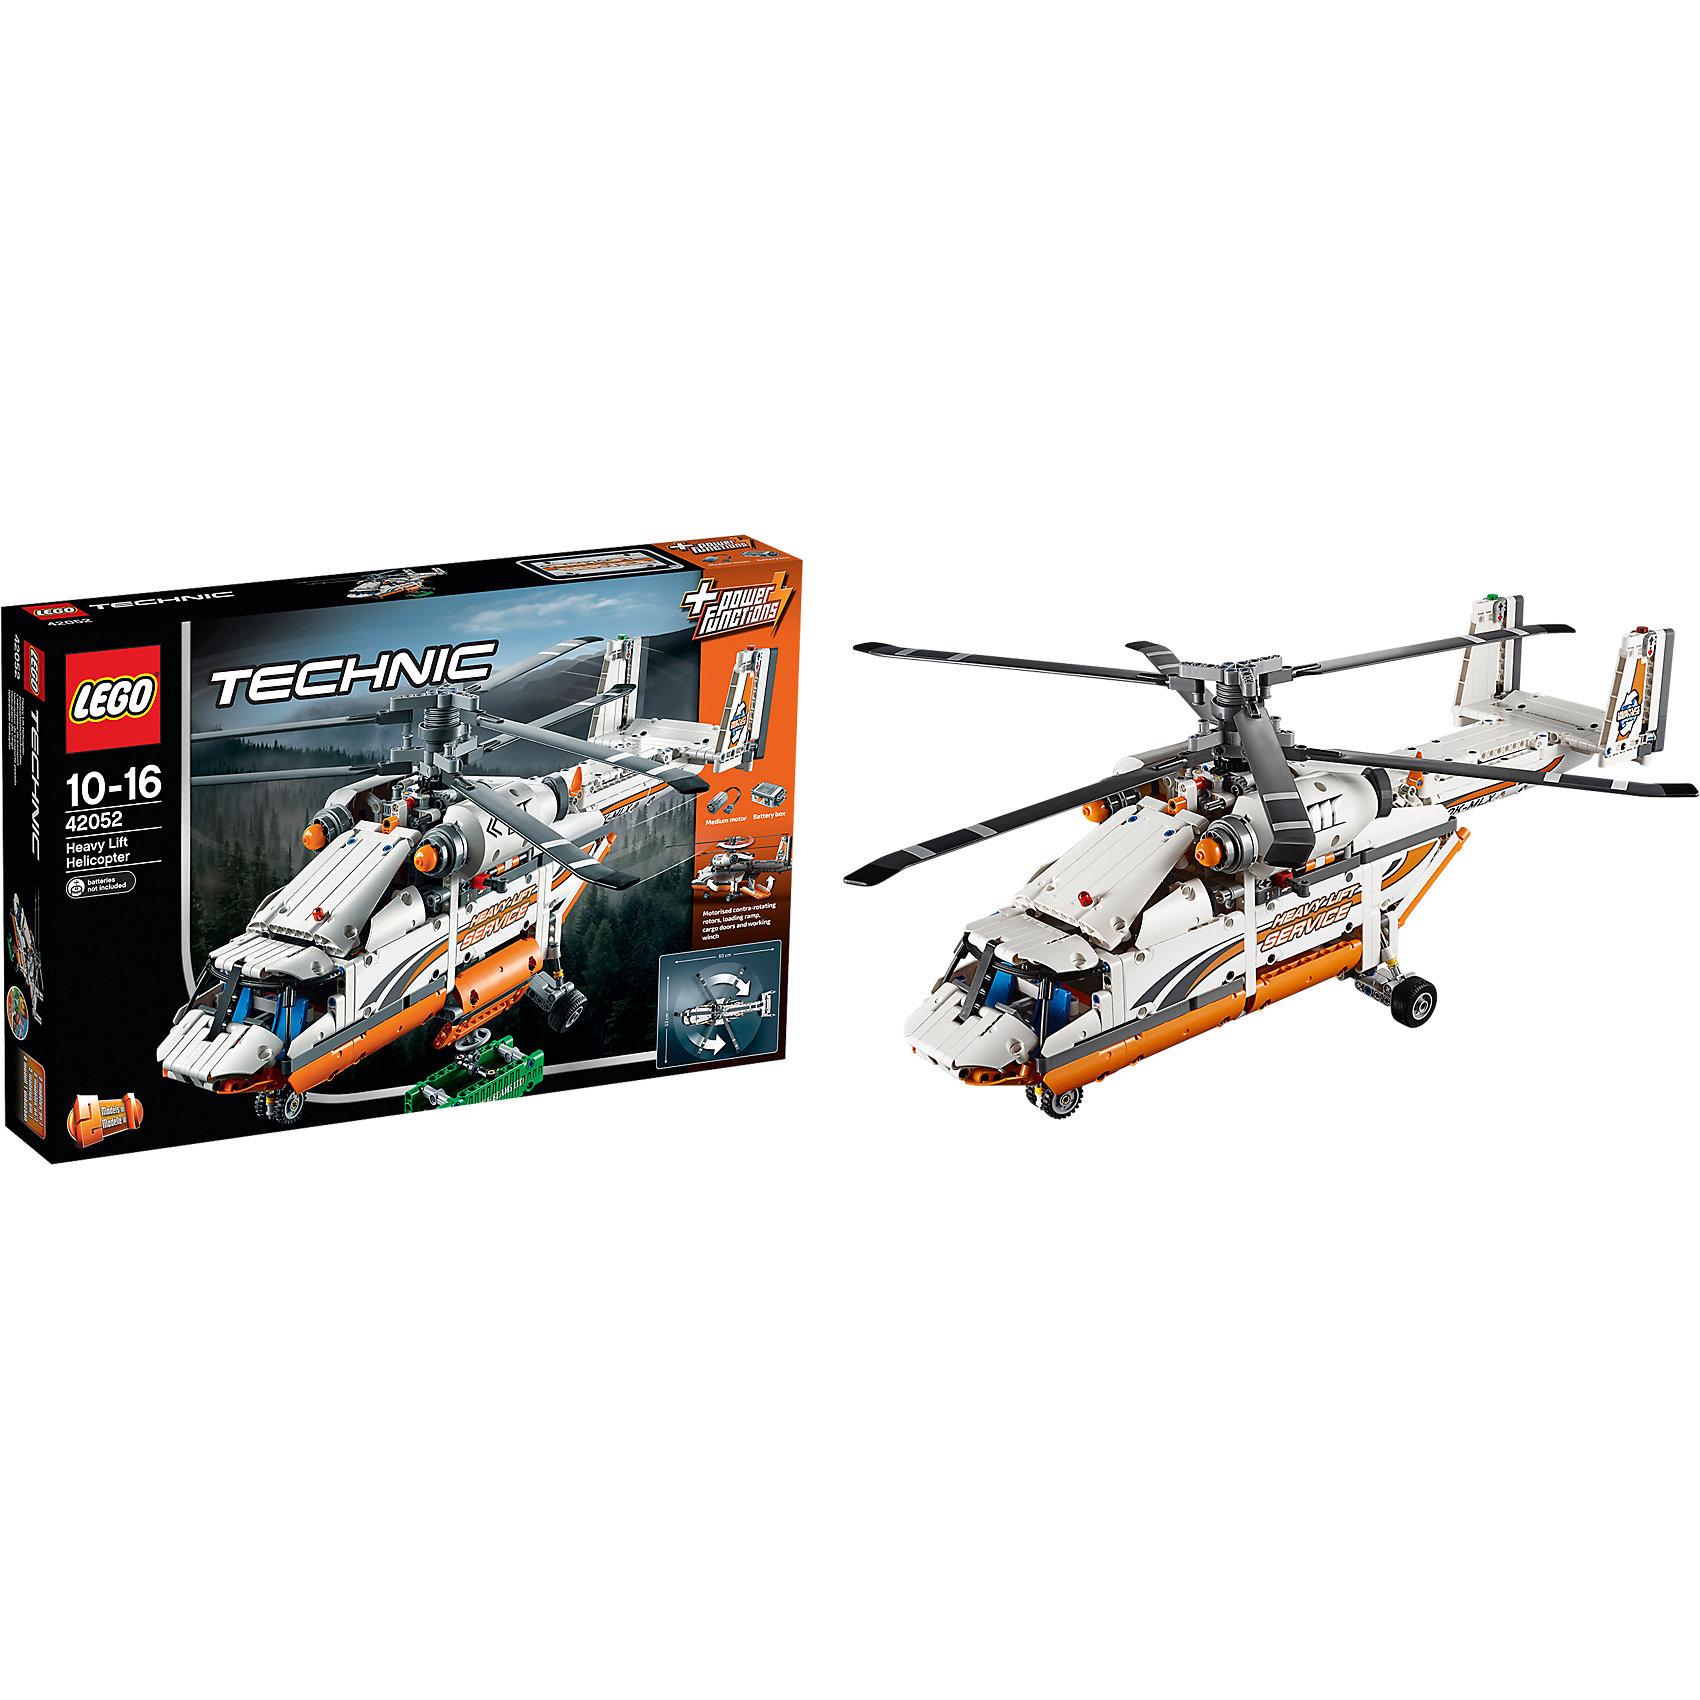 LEGO Technic 42052: Грузовой вертолет